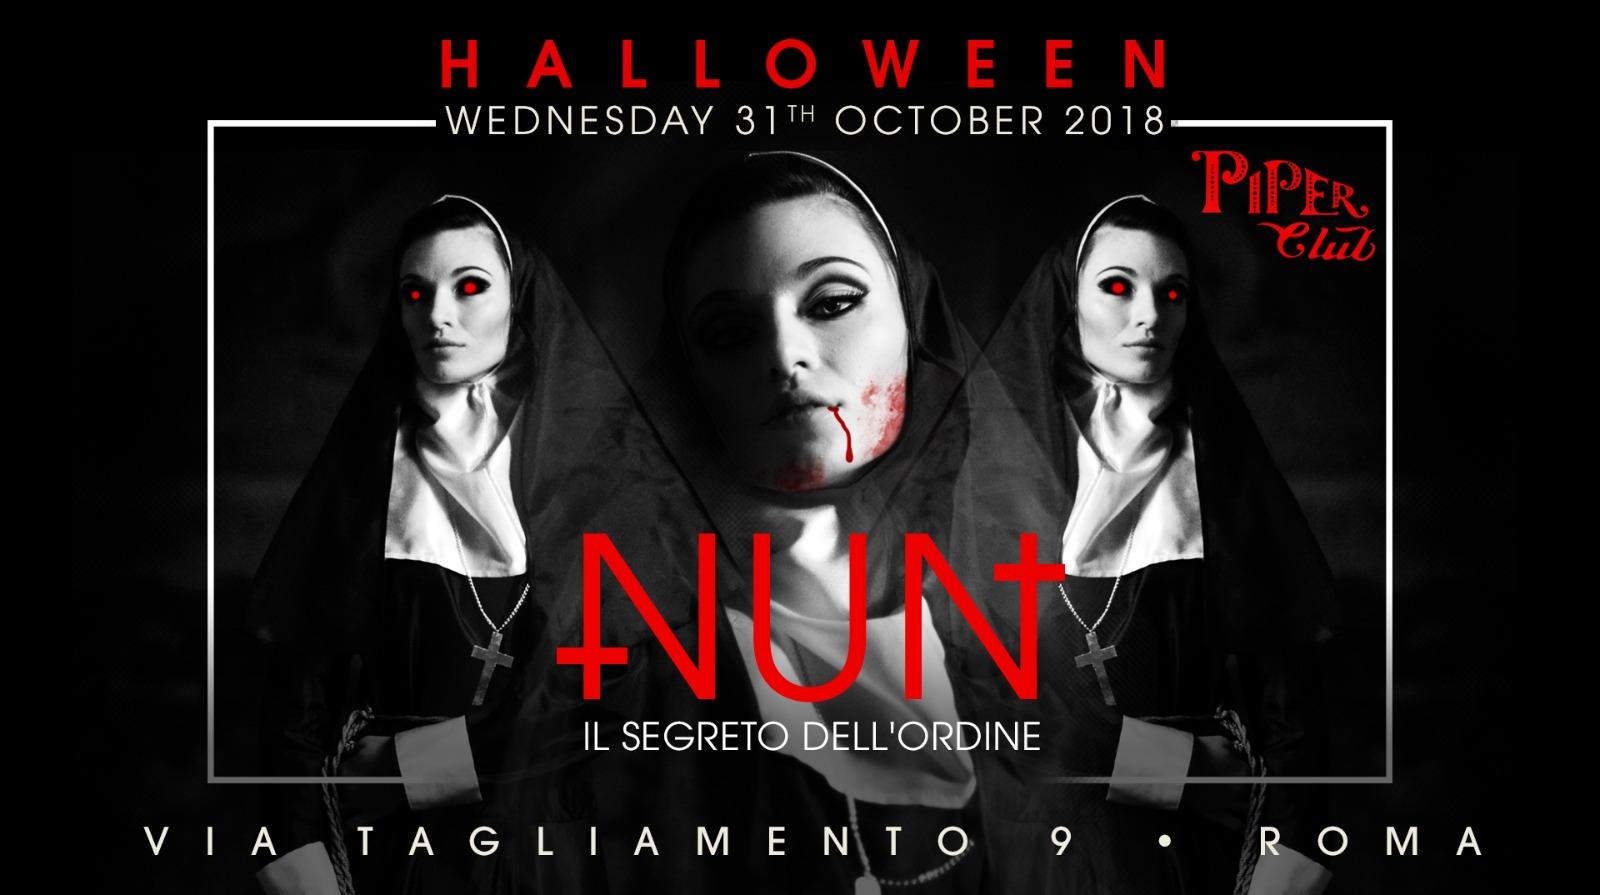 Festa Di Halloween A Roma.Halloween Piper Club 2018